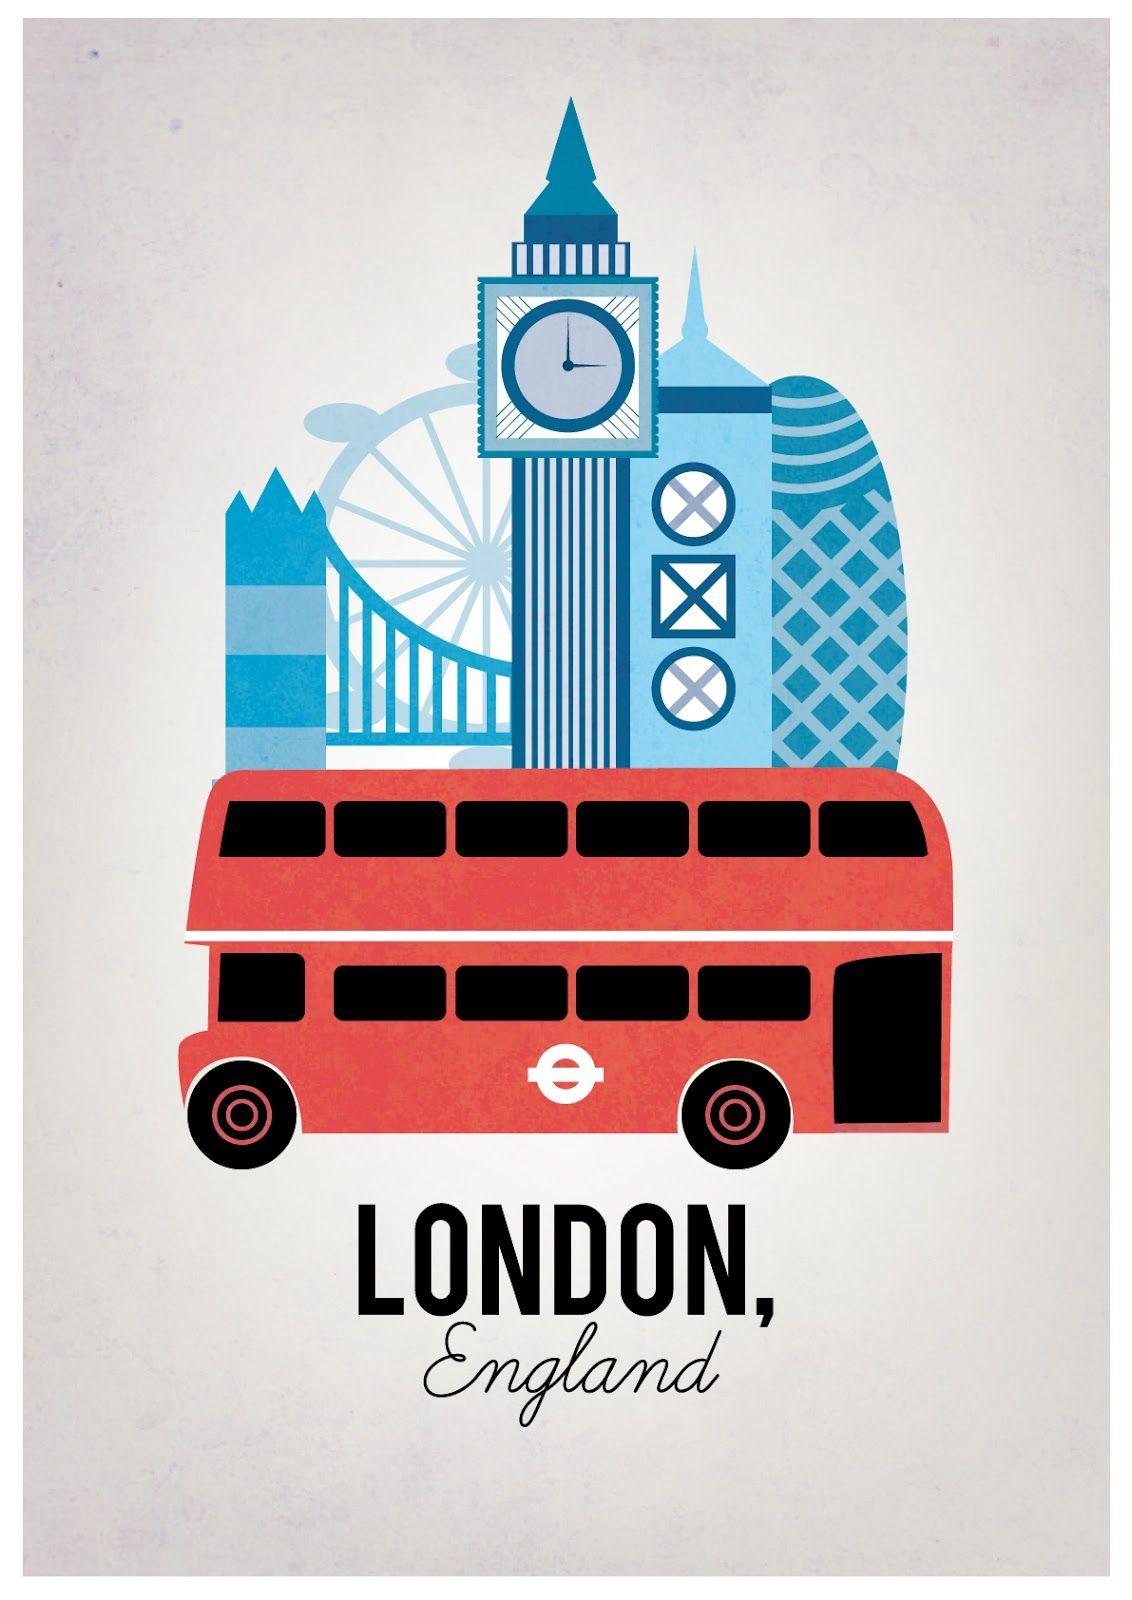 Mill Jane Illustration London Illustration London Poster London Art